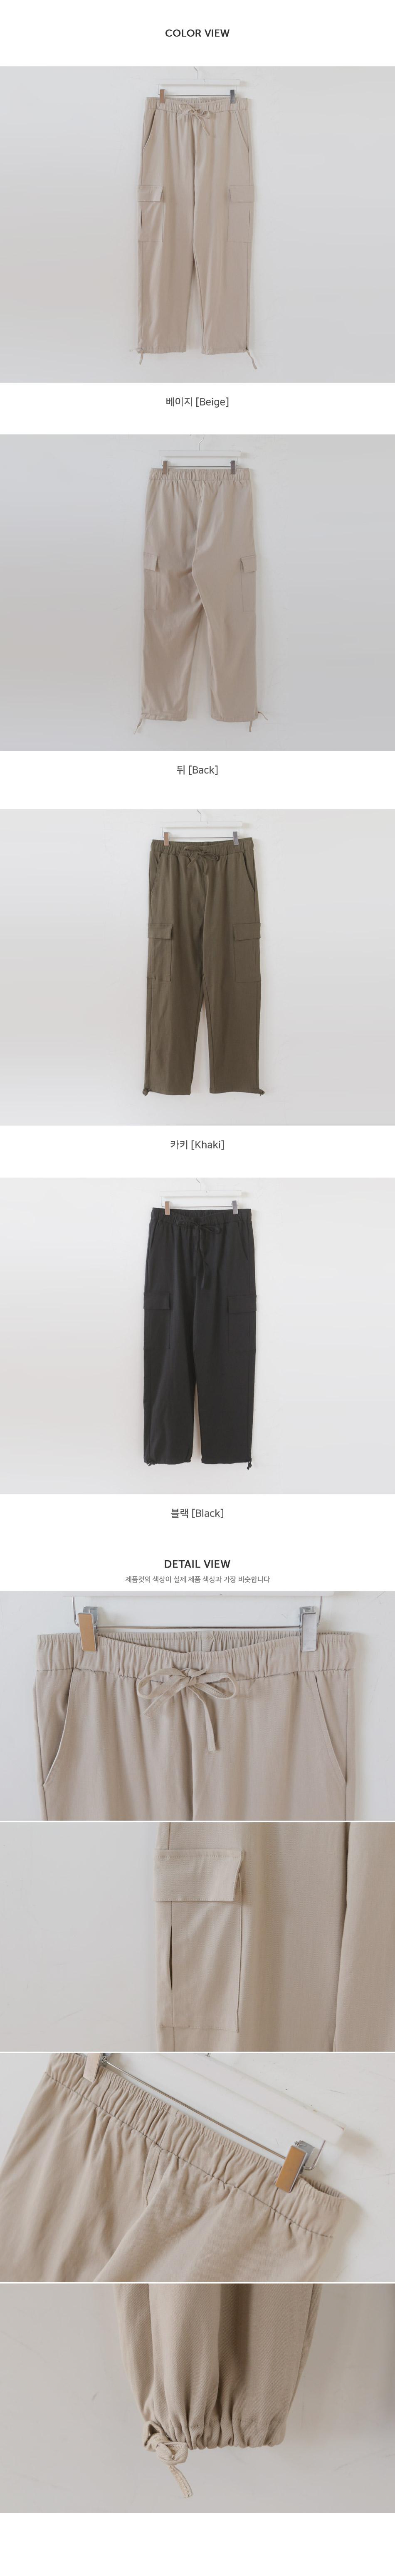 Resurgery jogger pants